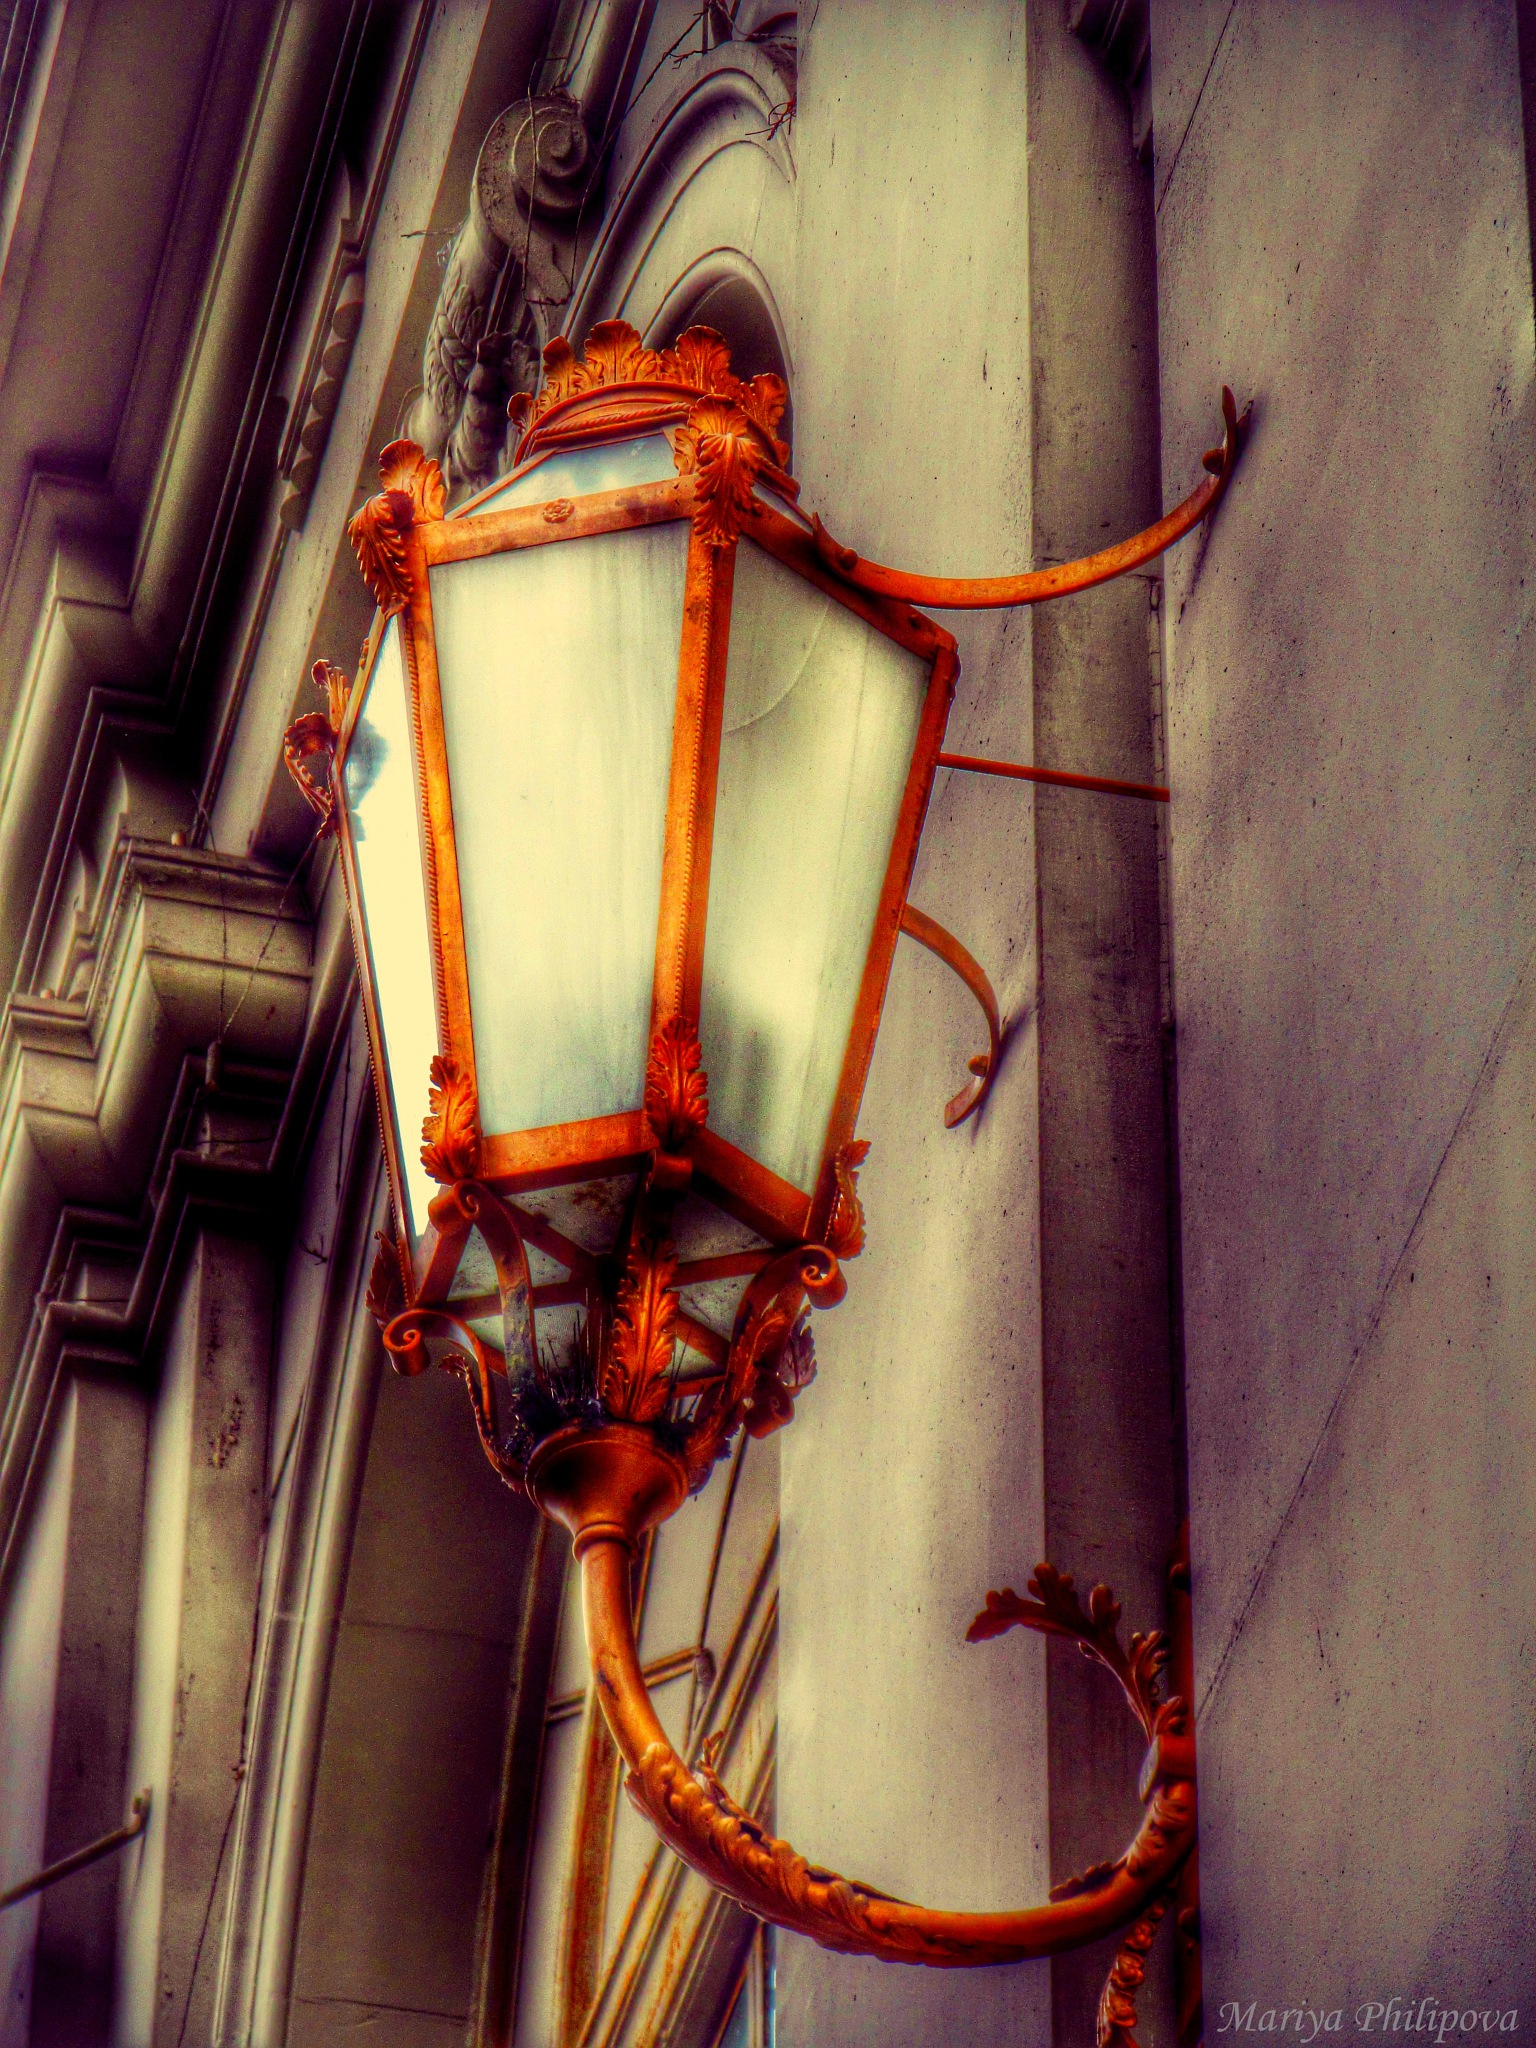 Fantastic details from New York - The Lanterns by MariyaPhilipova